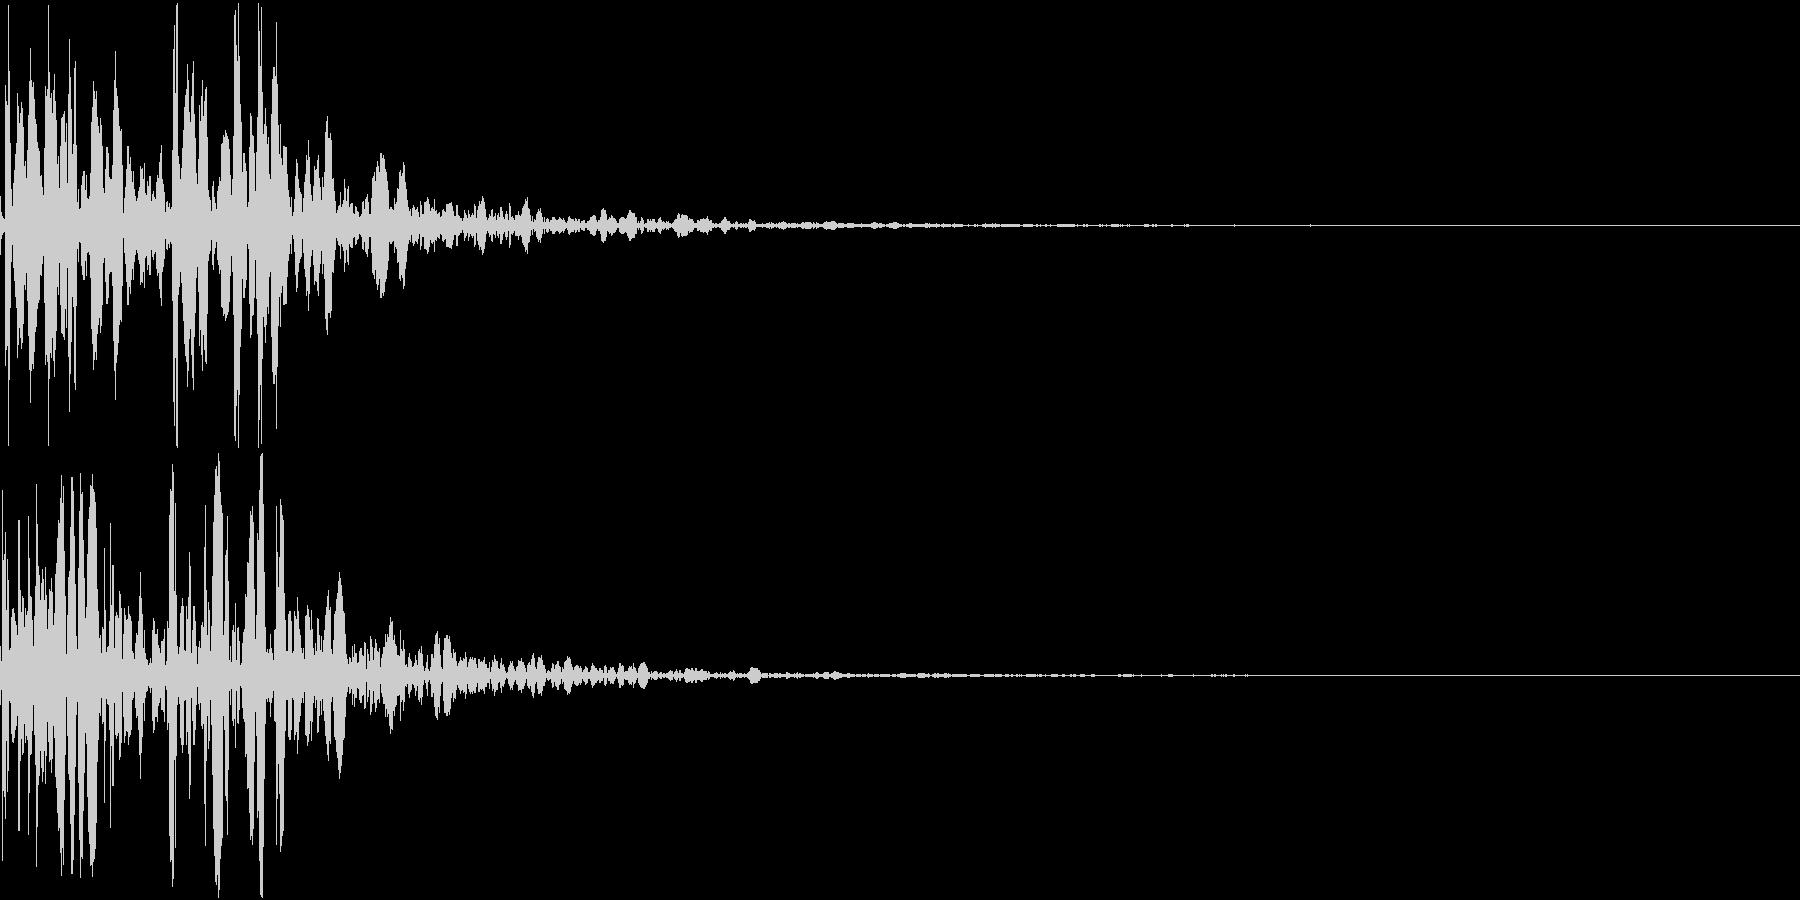 YAWARA 柔道の受け身の音 2の未再生の波形